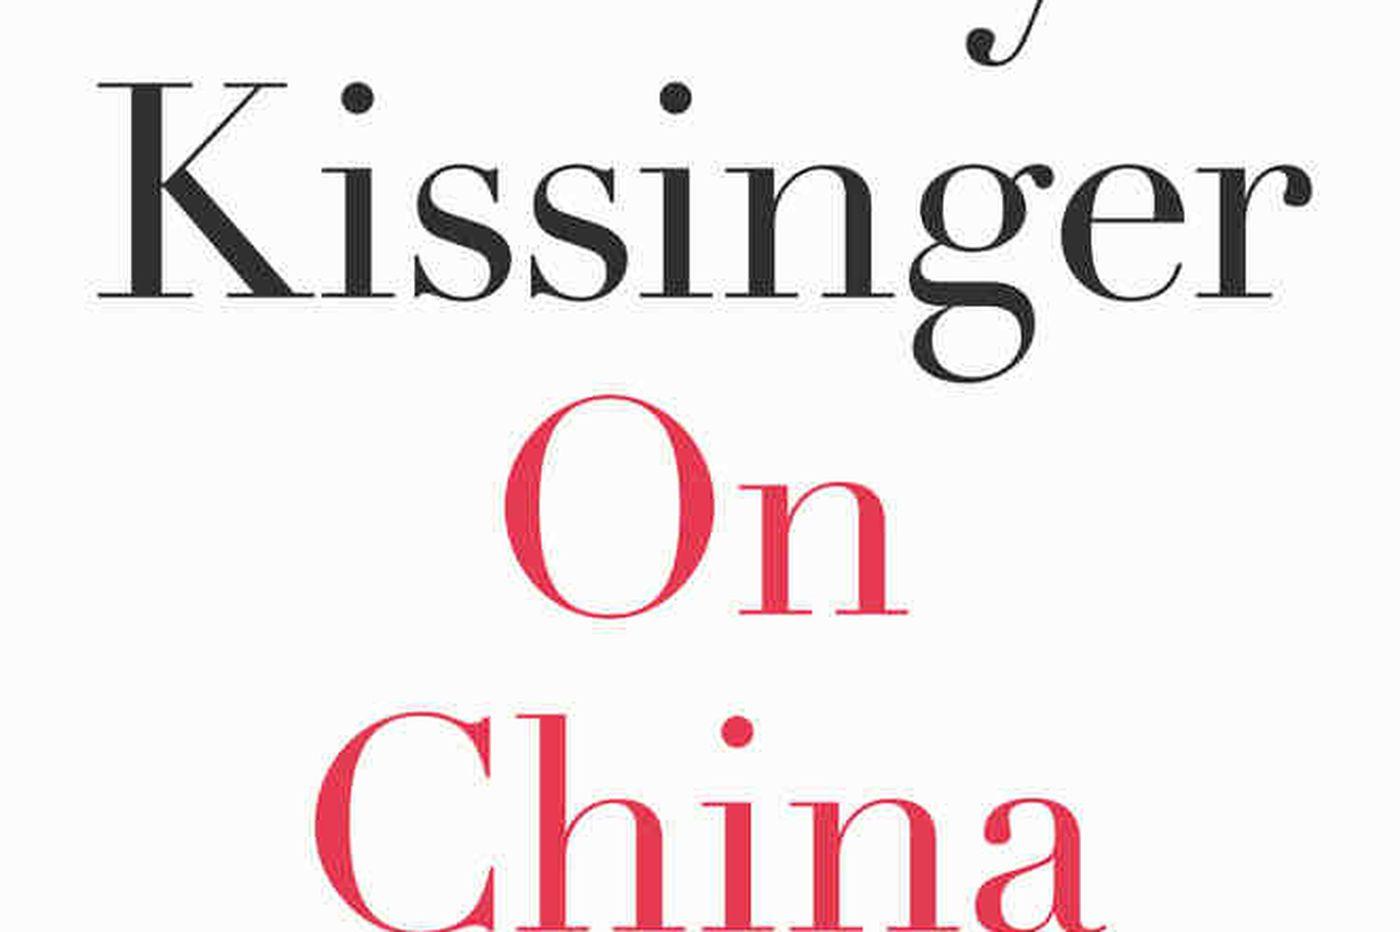 Key player looks at China